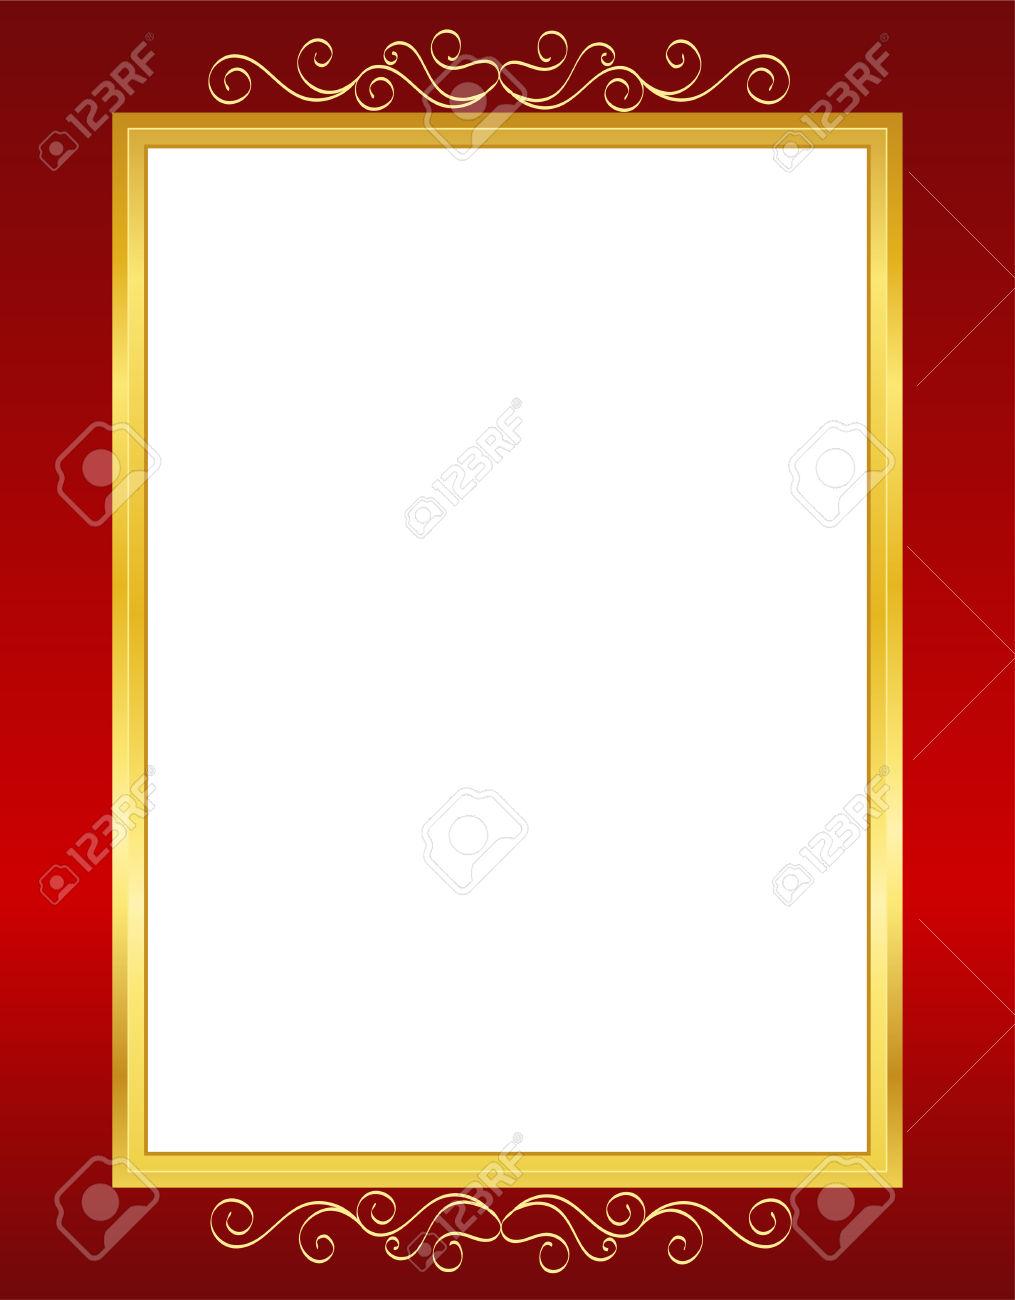 Elegant Wedding Invitation/ Anniversary Background / Frame Design